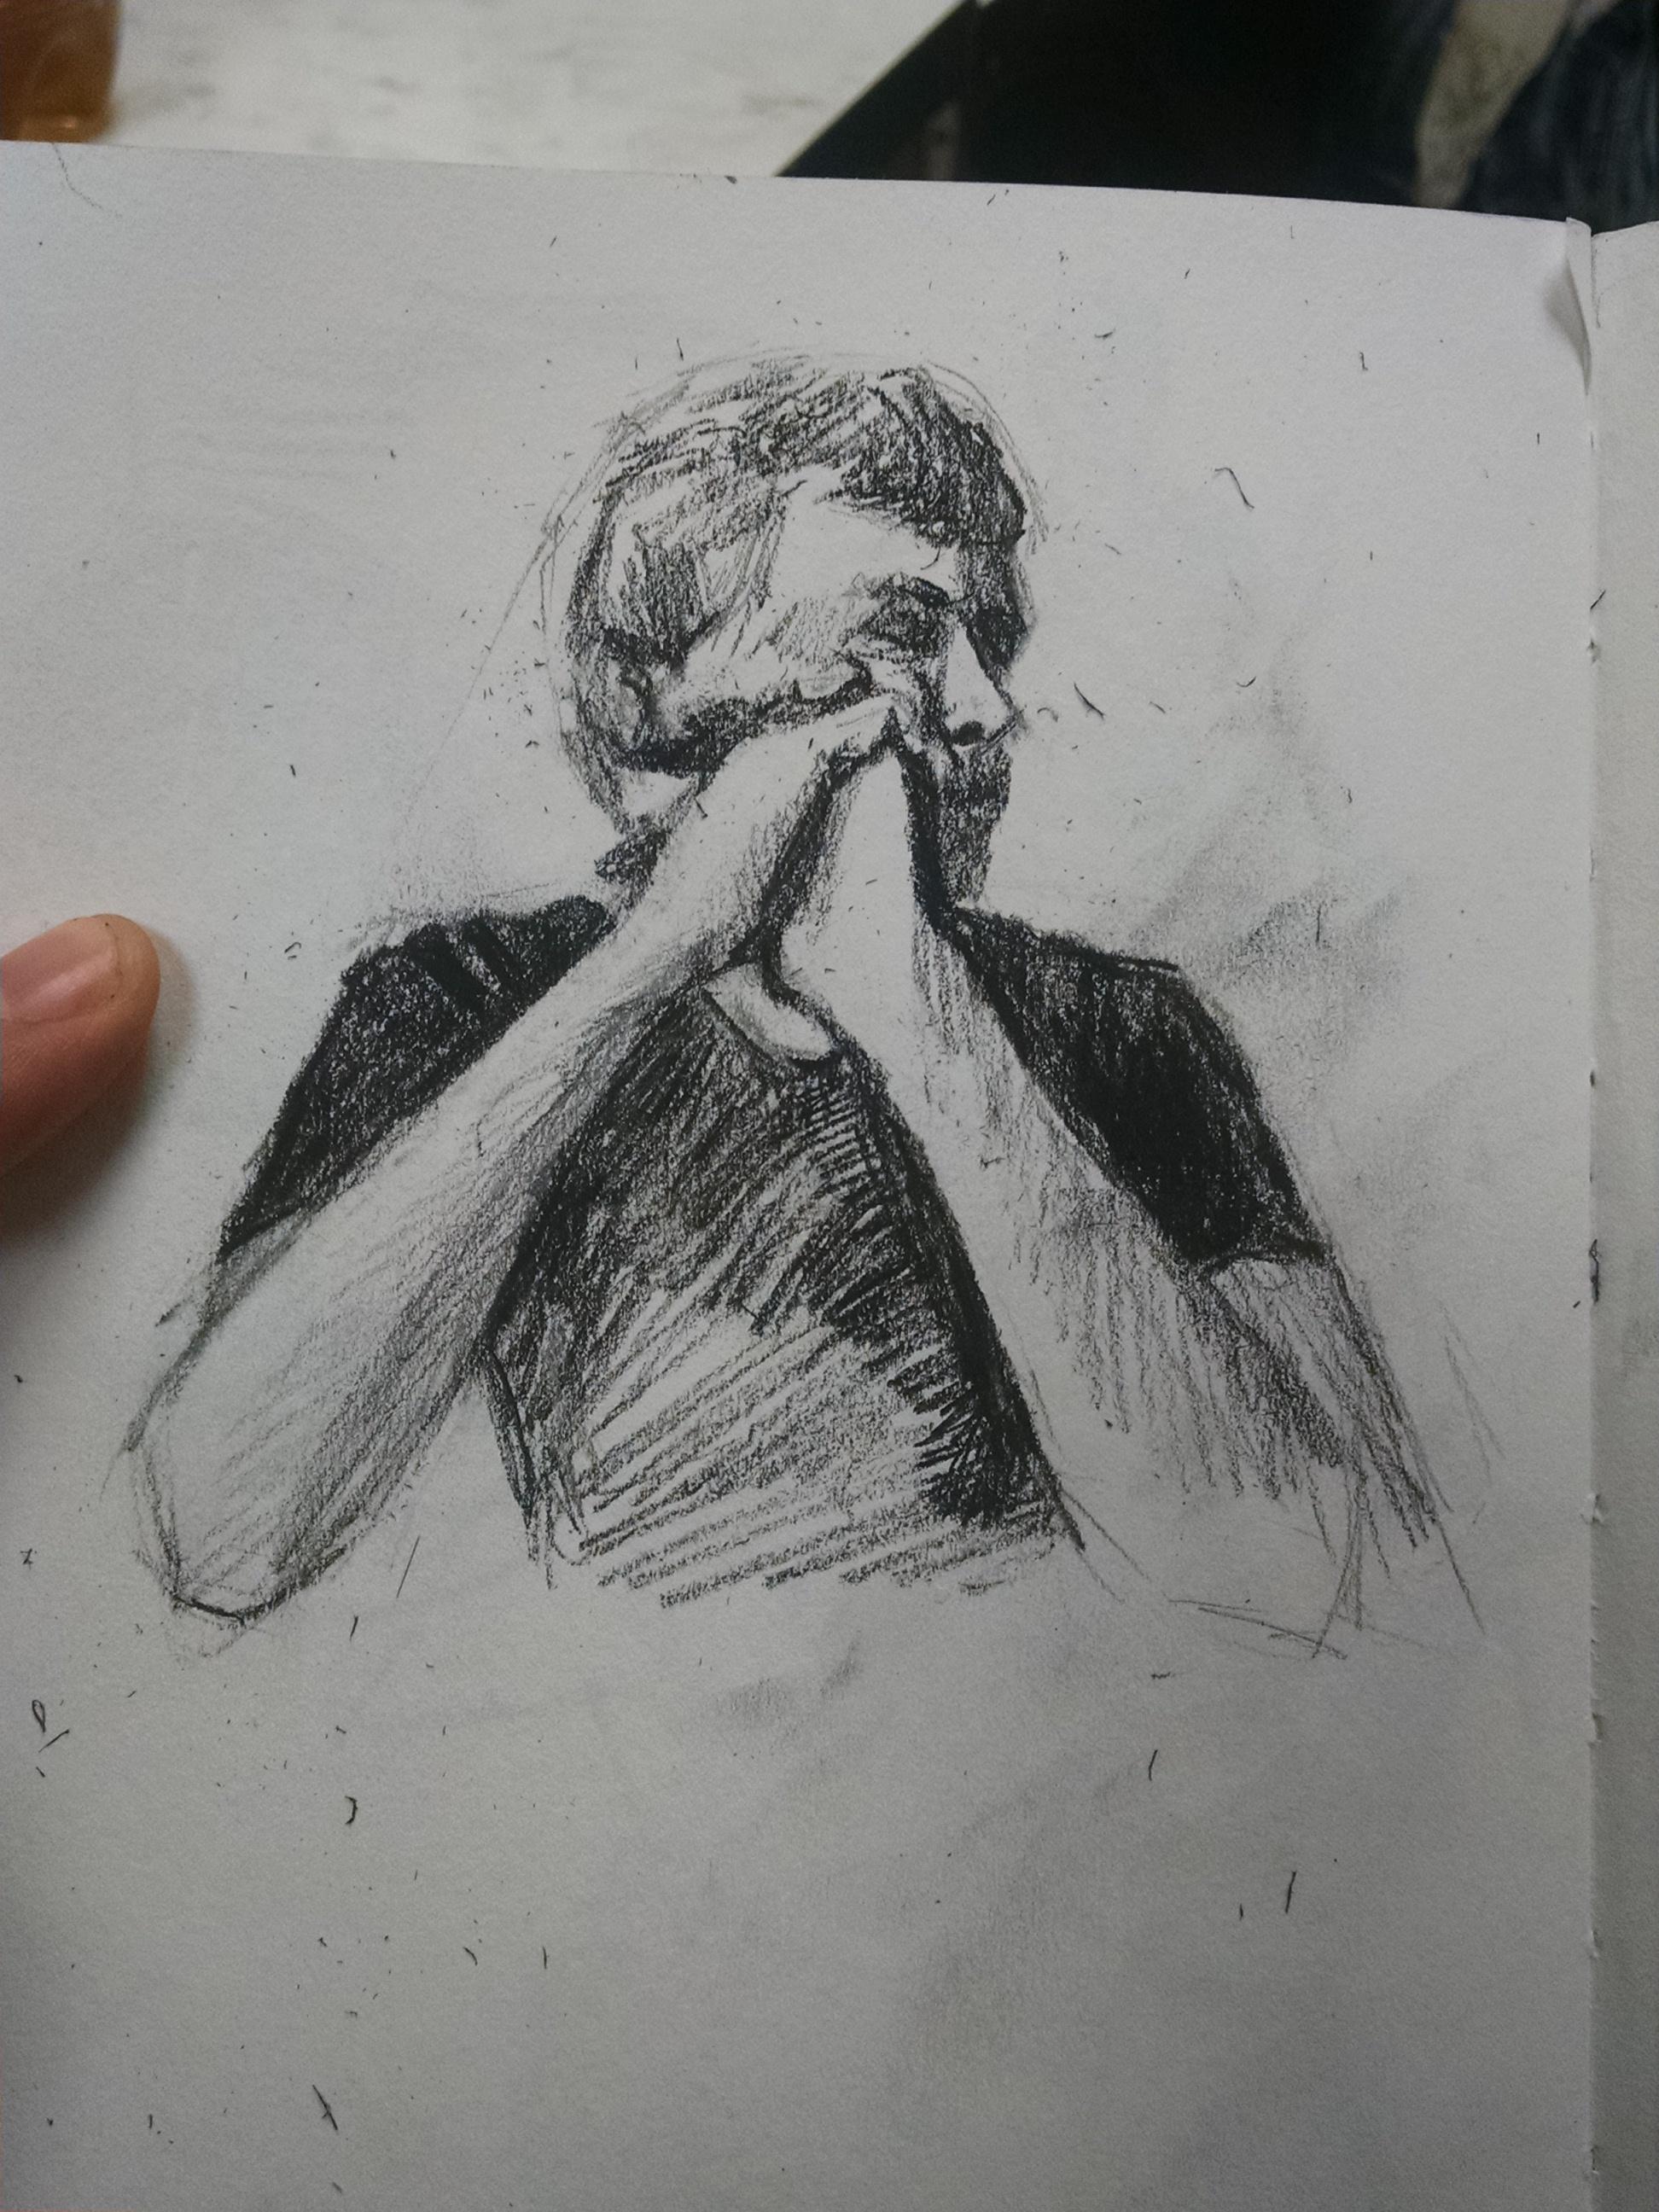 allison pillari sketchbook 11-21